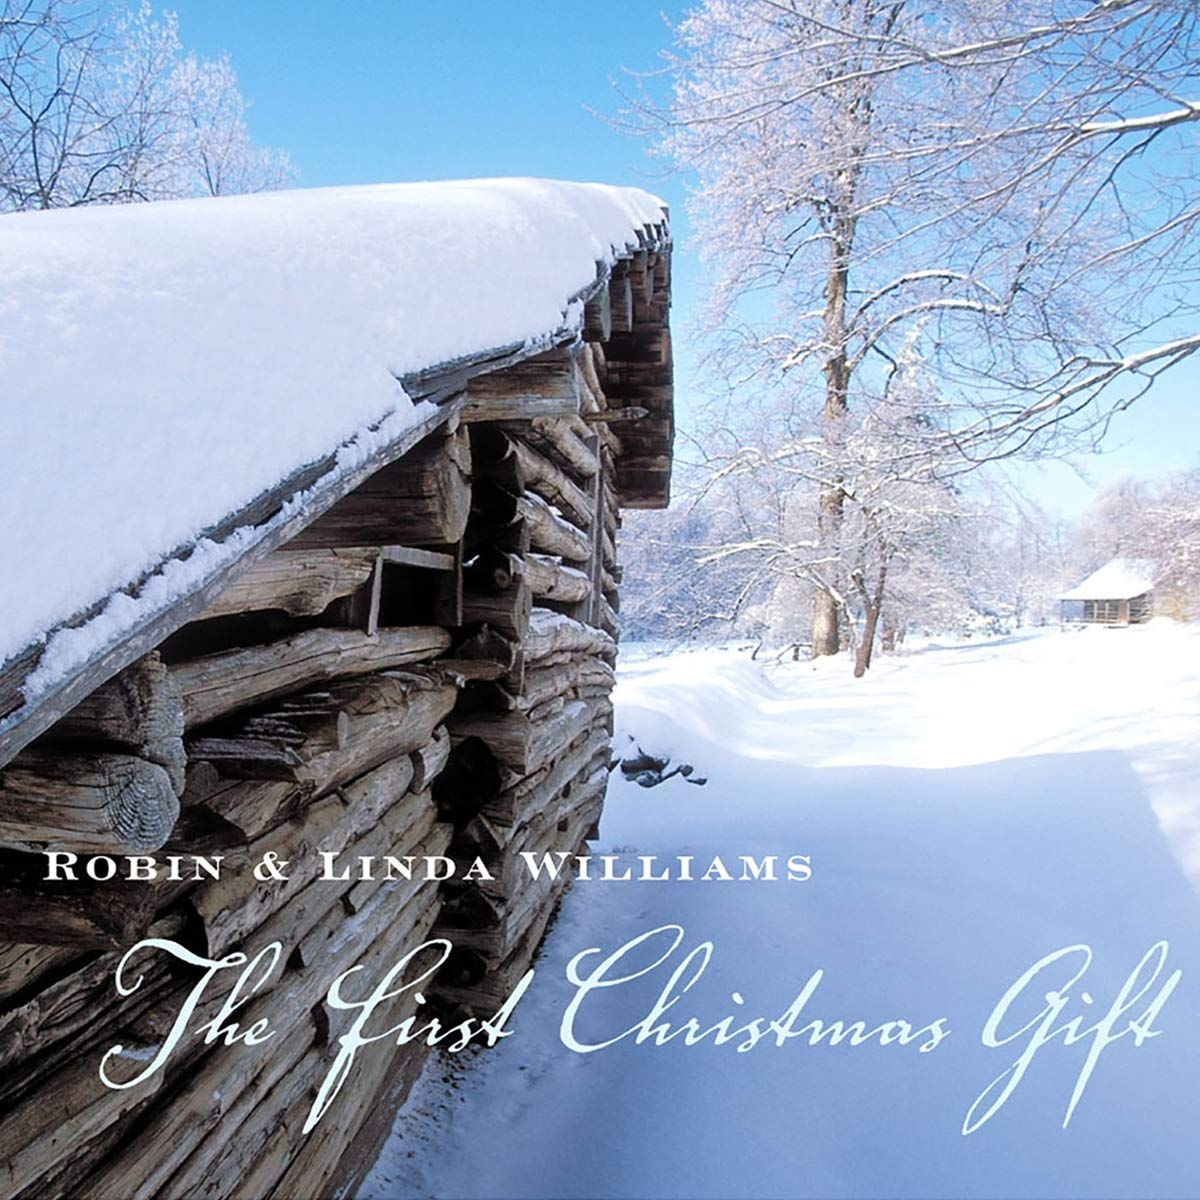 Robin & Linda Williams - The First Christmas Gift Album Art